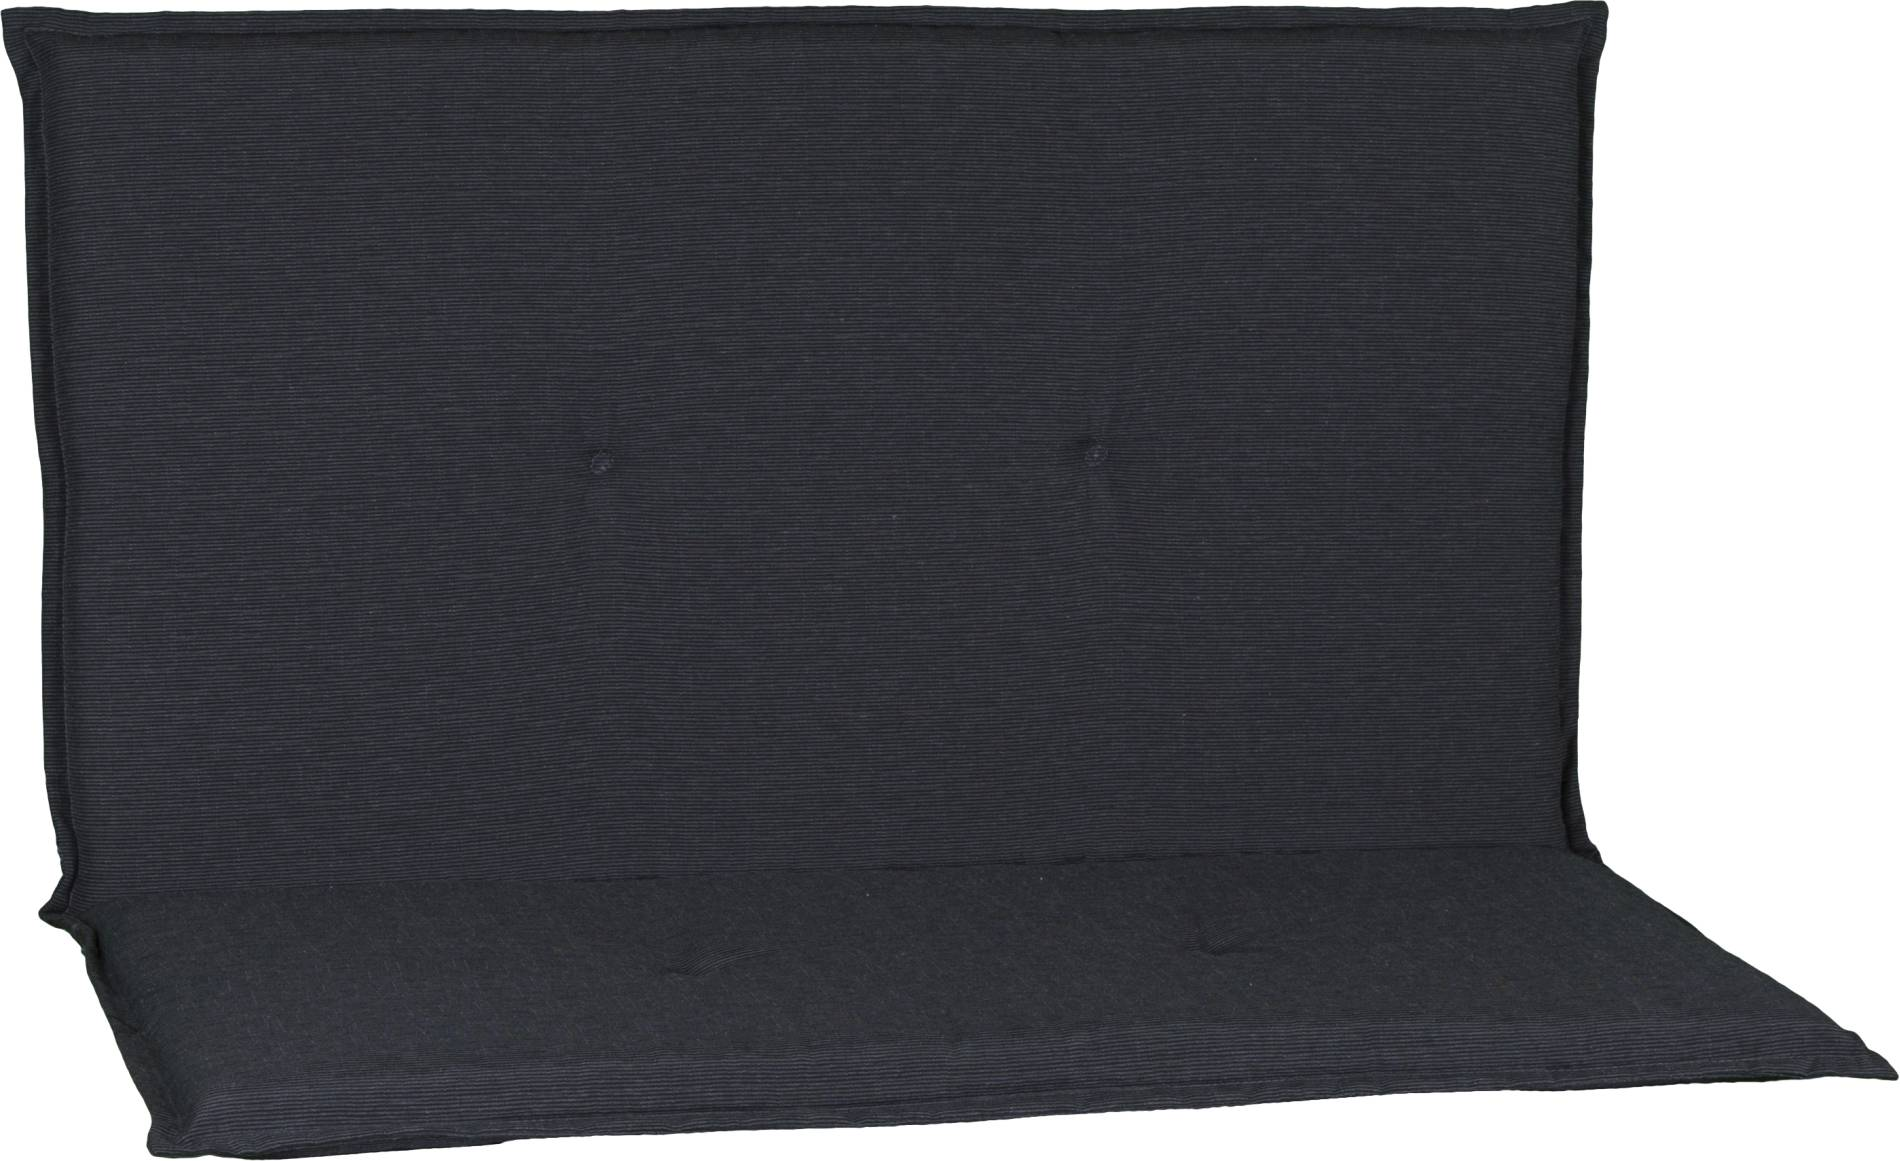 acamp 2-er Bankkissen Dunkelgrau meliert Typ-O 97 x 99 x 4 cm passend für Stapelbank Stratos